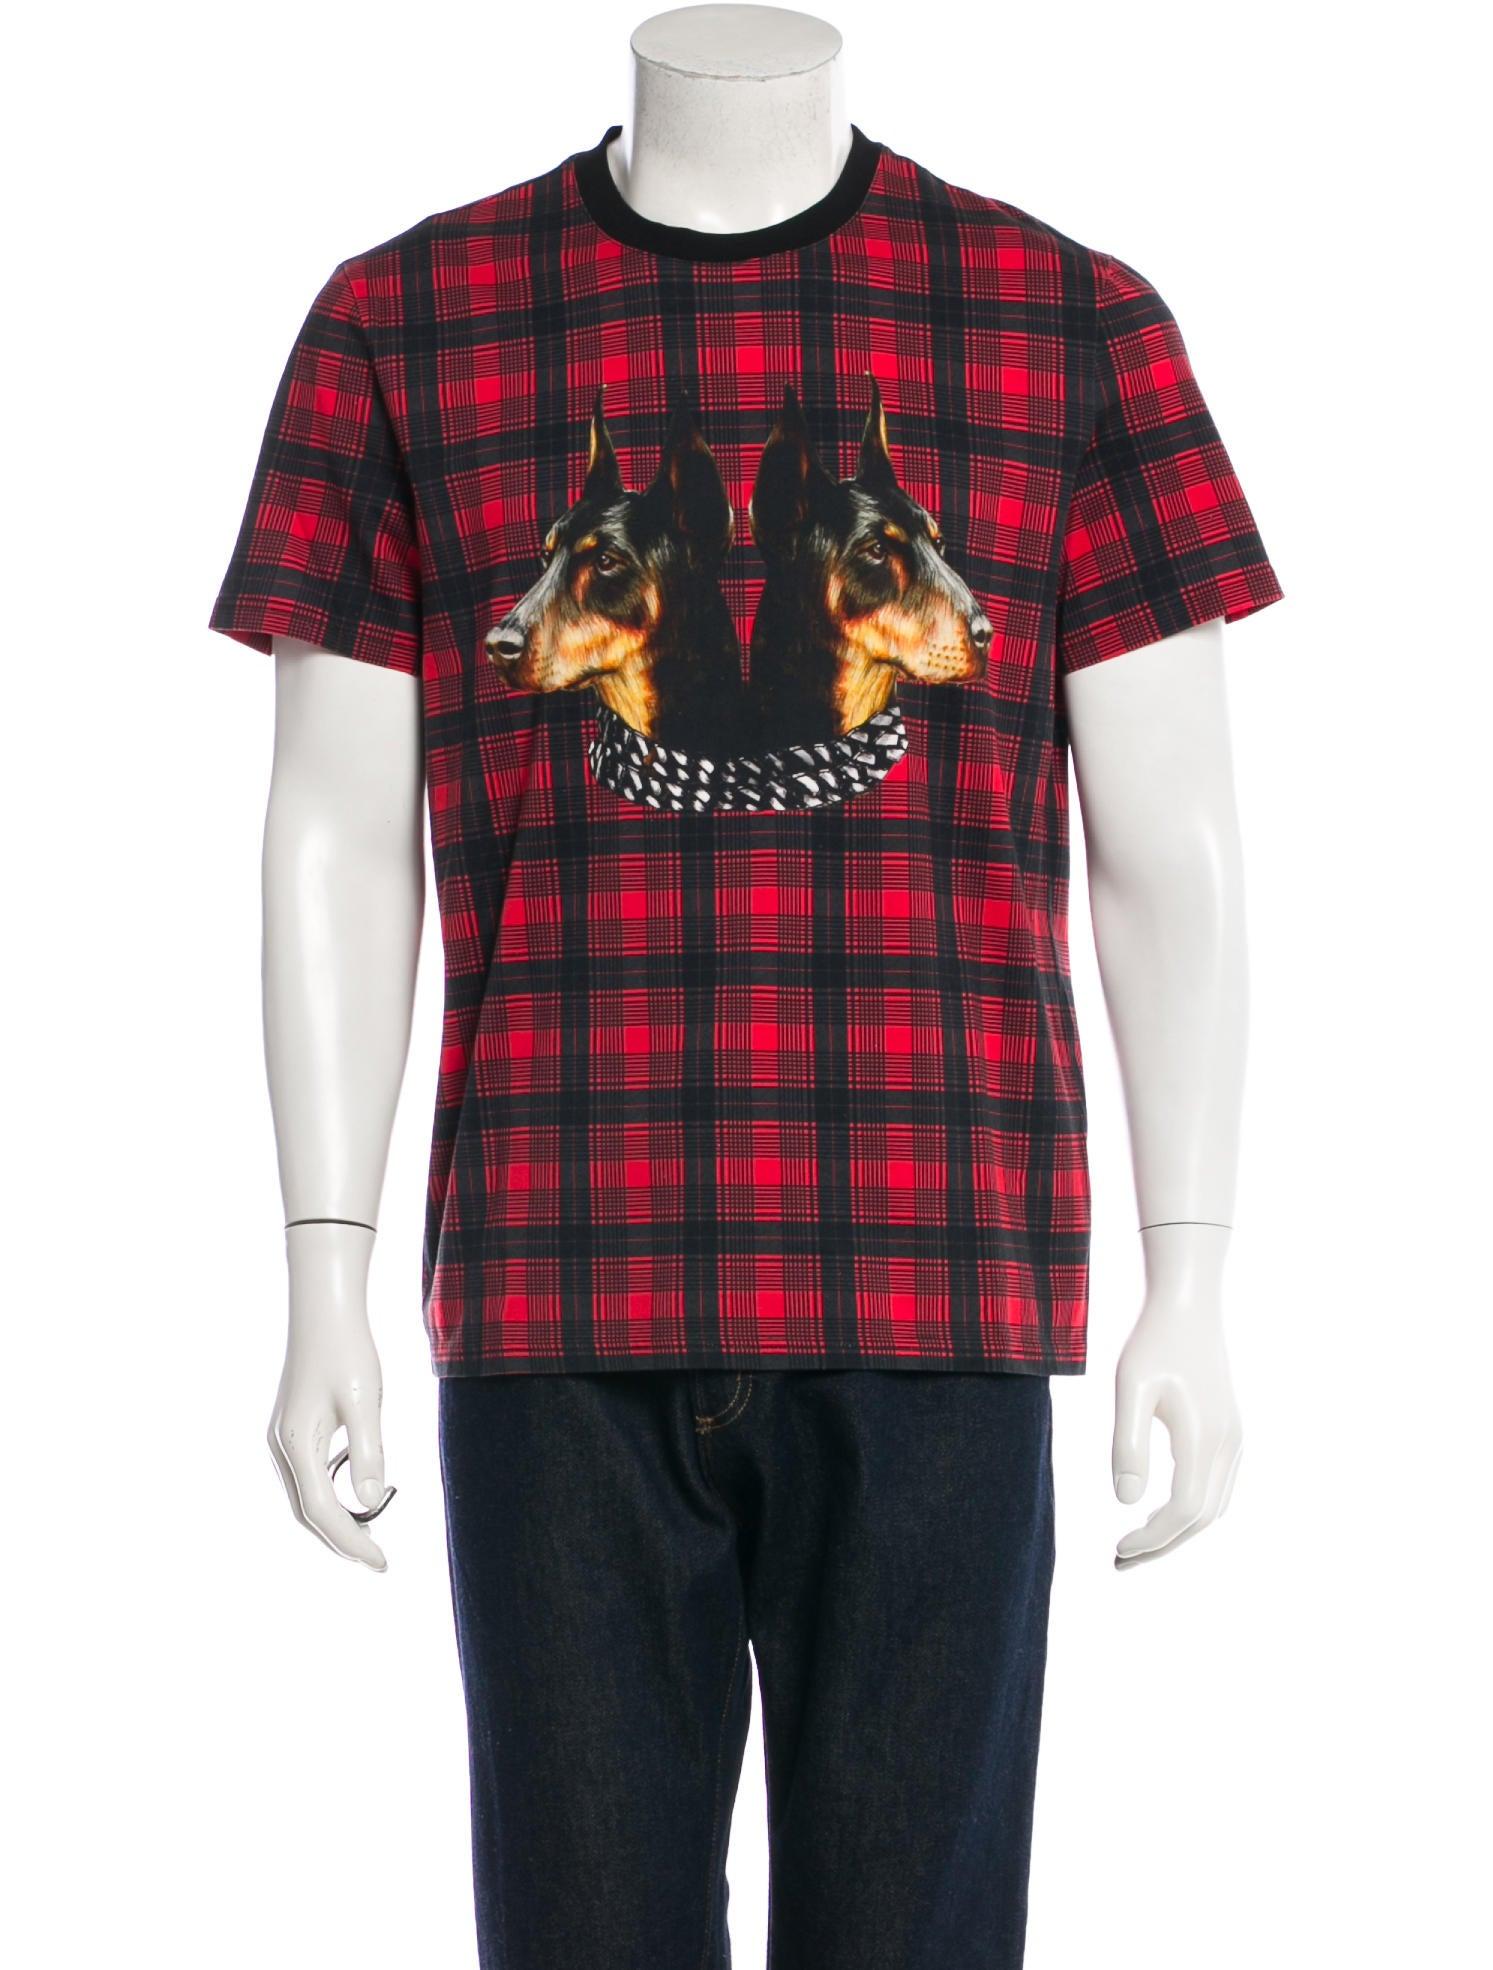 368ce8eca9e0 Givenchy Plaid Doberman Print T-Shirt - Clothing - GIV29168